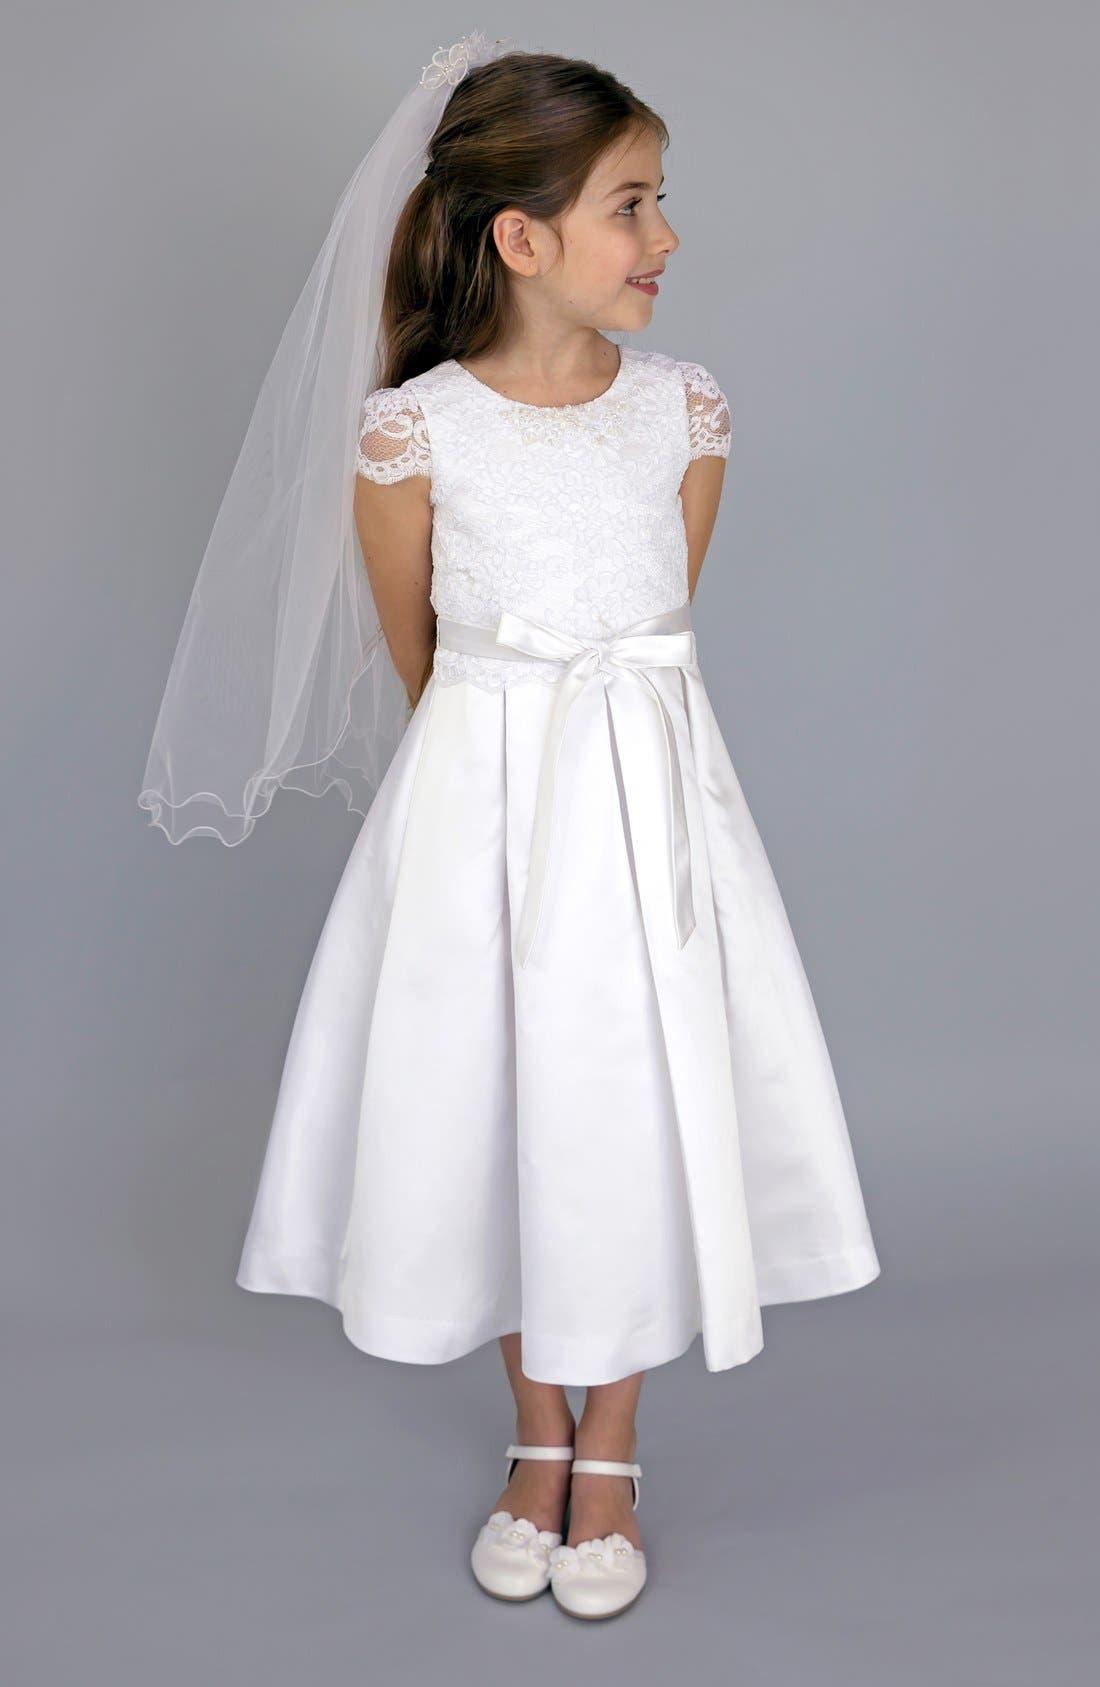 Lace Bodice Box Pleat Dress,                             Main thumbnail 1, color,                             WHITE